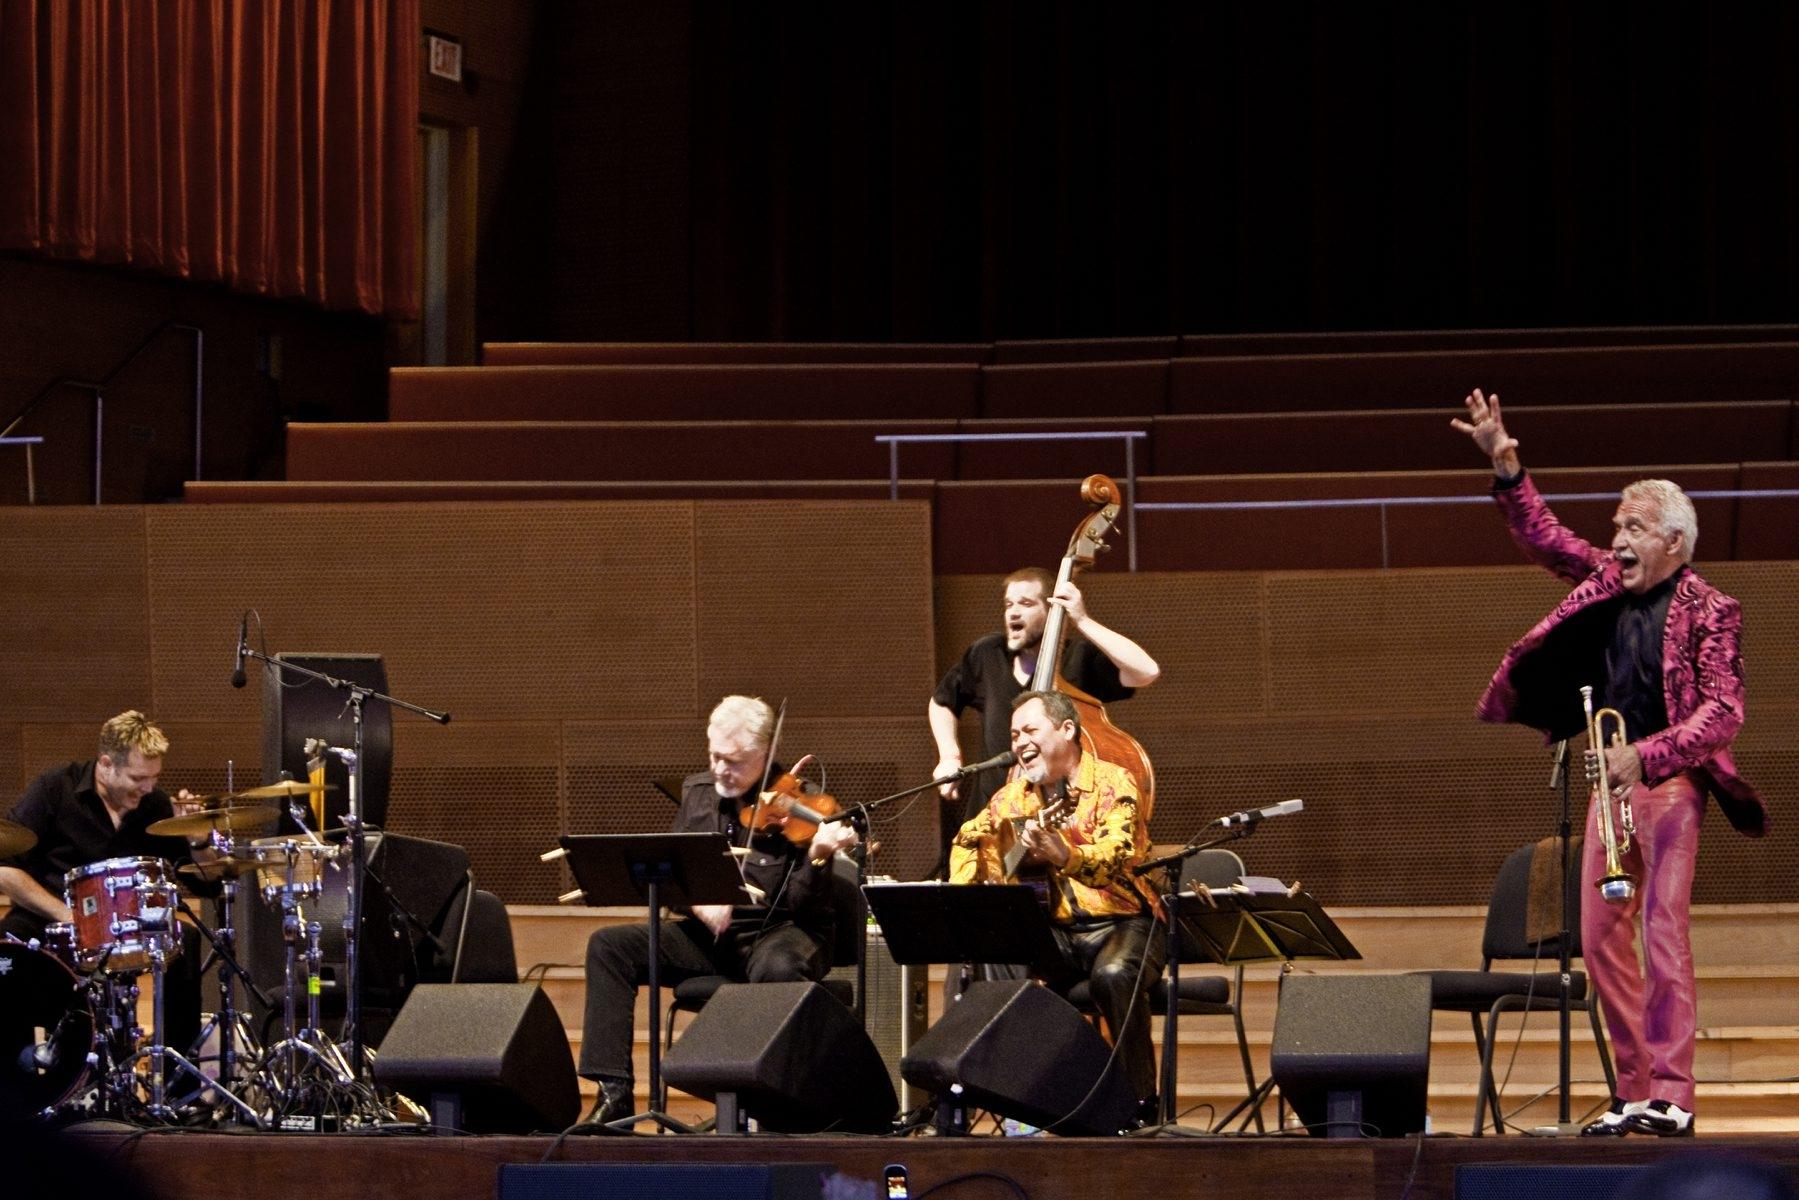 "EL RITMO DE LA VIDA  Doc Severinsen, trumpet, and Gil GutiÈrrez, guitar, brought their band, El Ritmo de la Vida, to the Pritzker Pavilion in Chicago's Millennium Park on Thursday, June 24, 2010, for the ""Noche en Mexico,"" part of the Music Without Borders series."